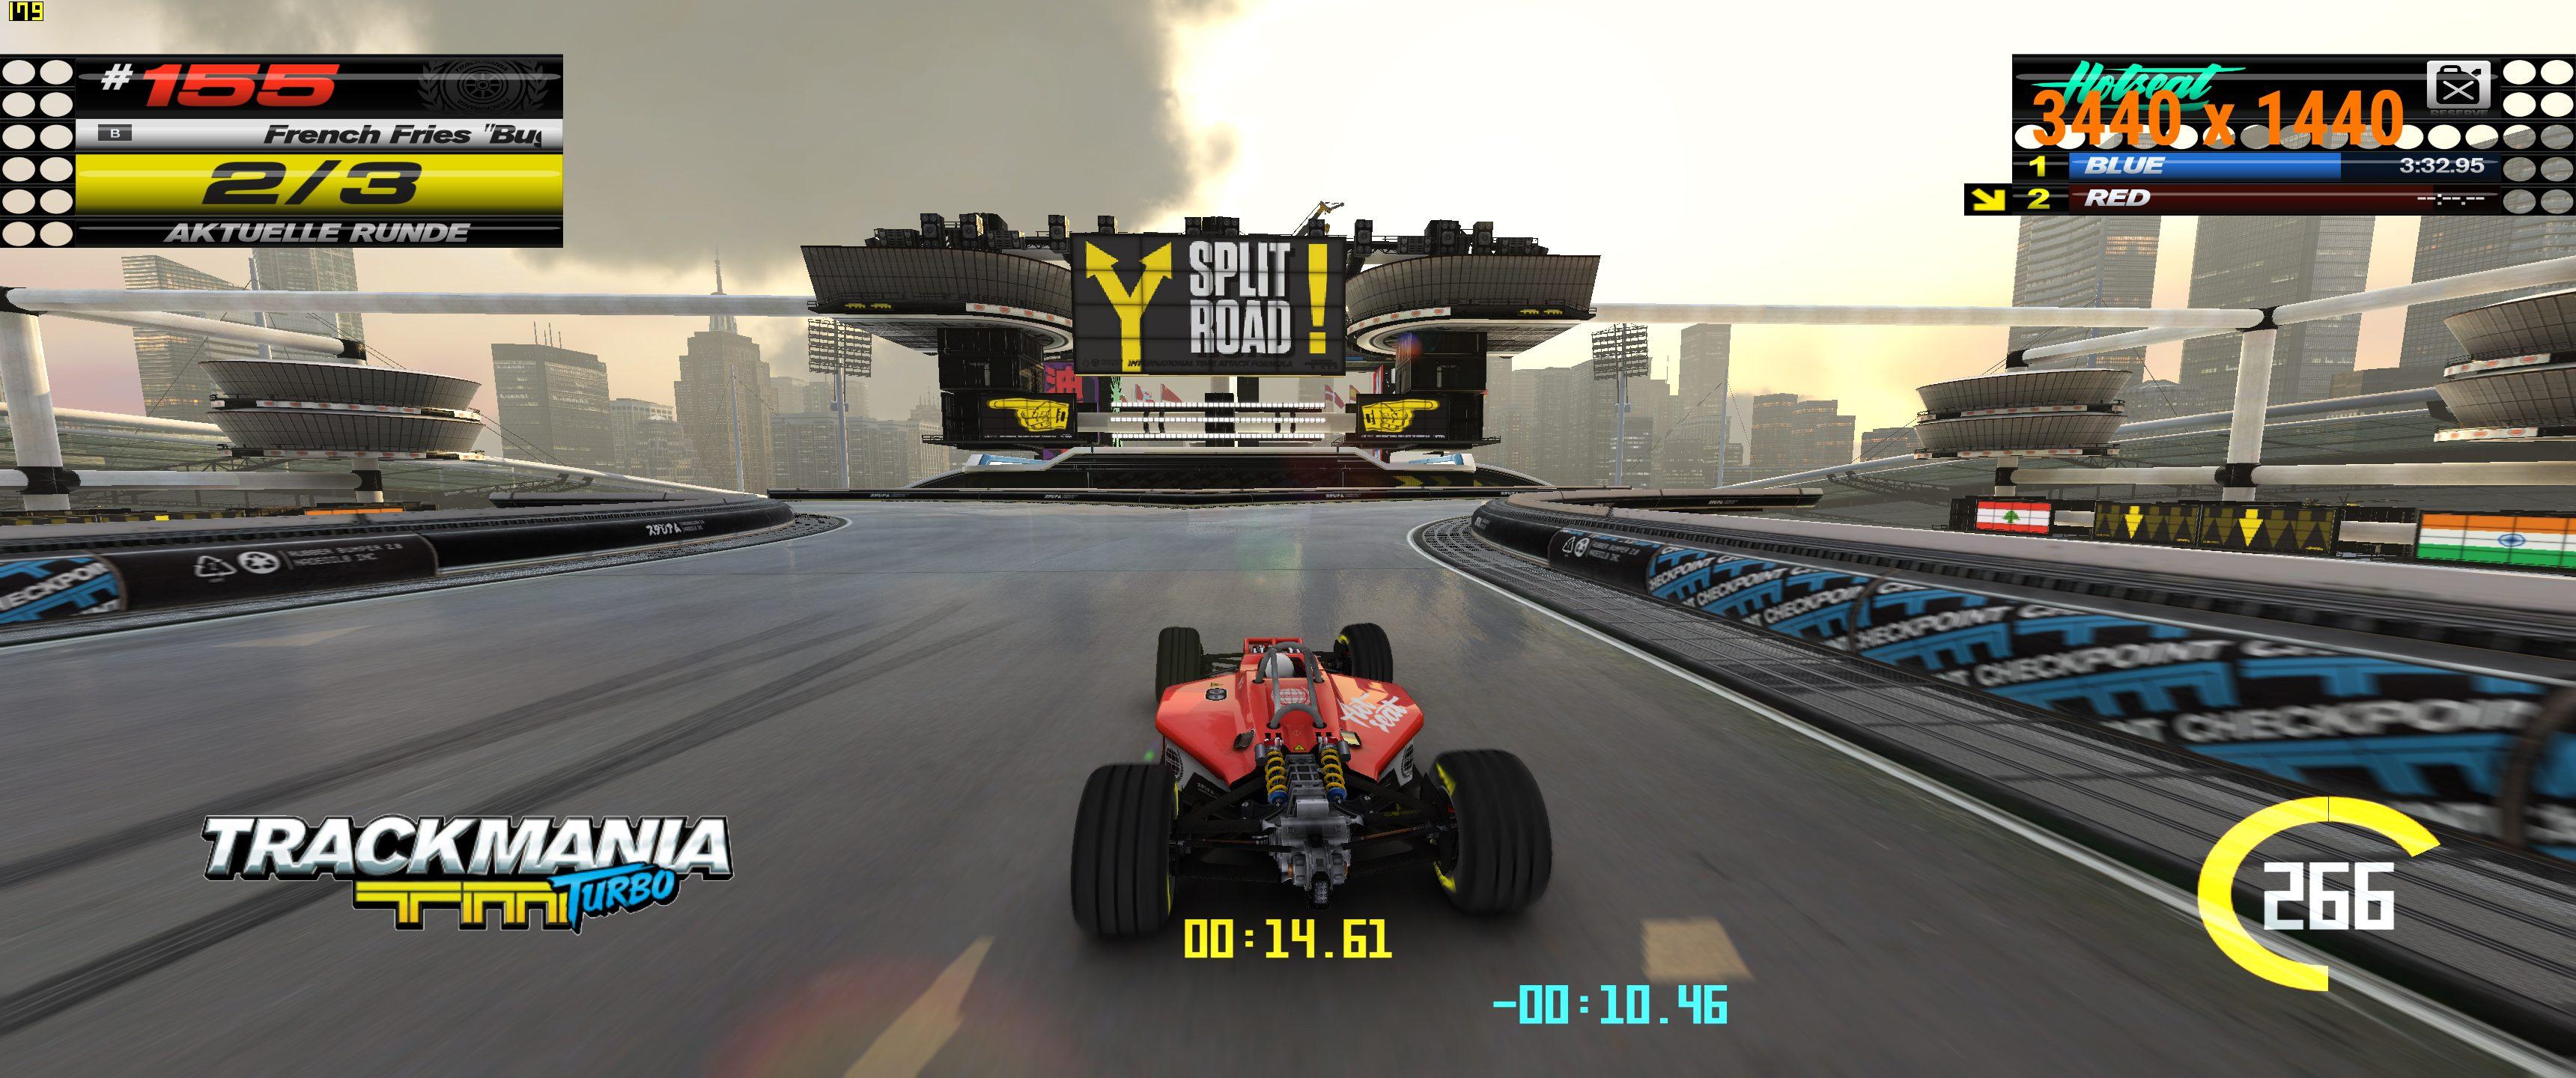 Game-7-3440-Track-Mania-Turbo